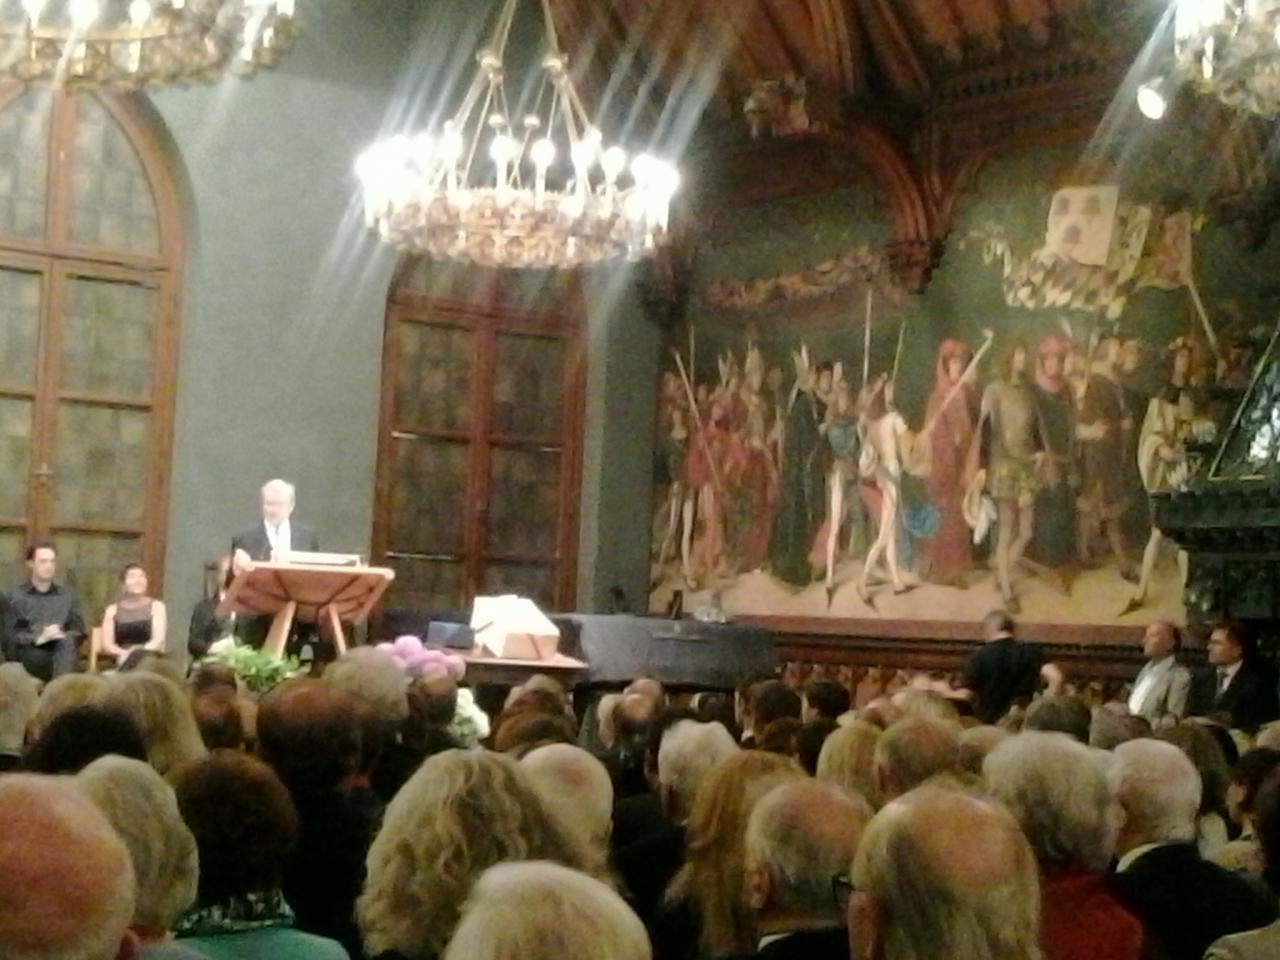 Discours de Josef Deimer dans la Rathausprunksaal